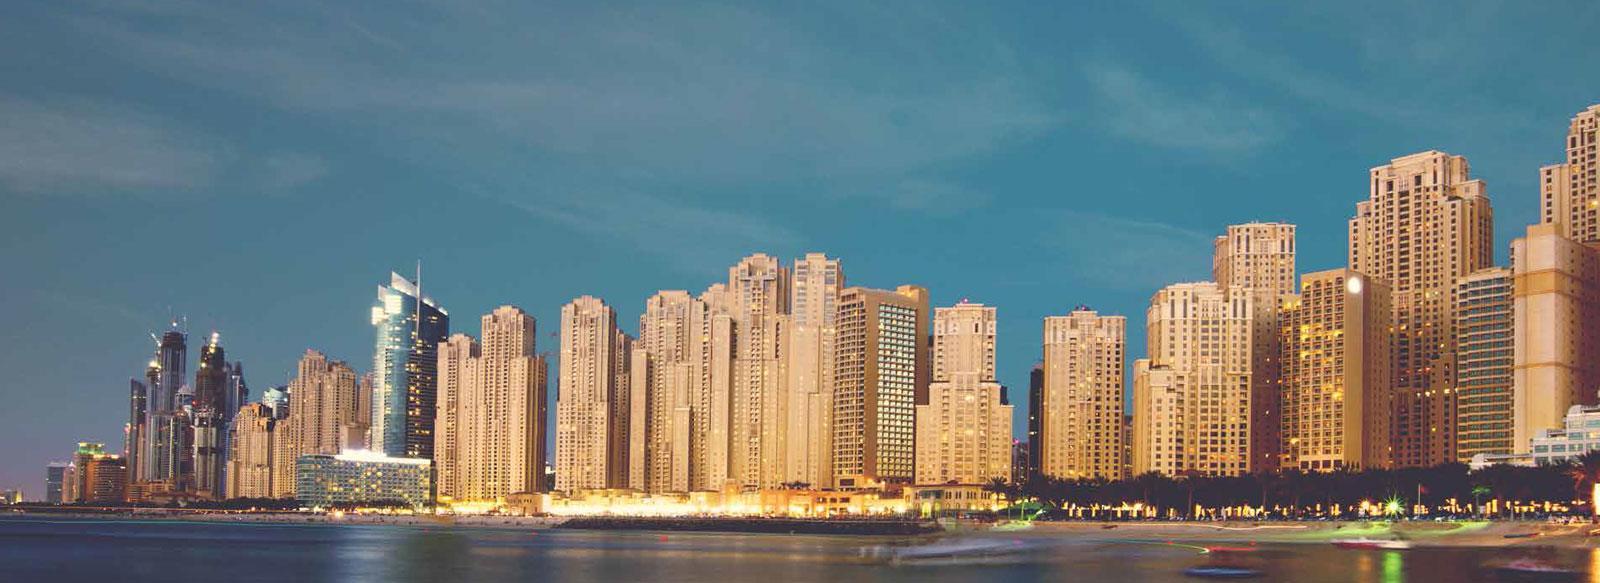 1 JBR Apartments, JBR, Dubai